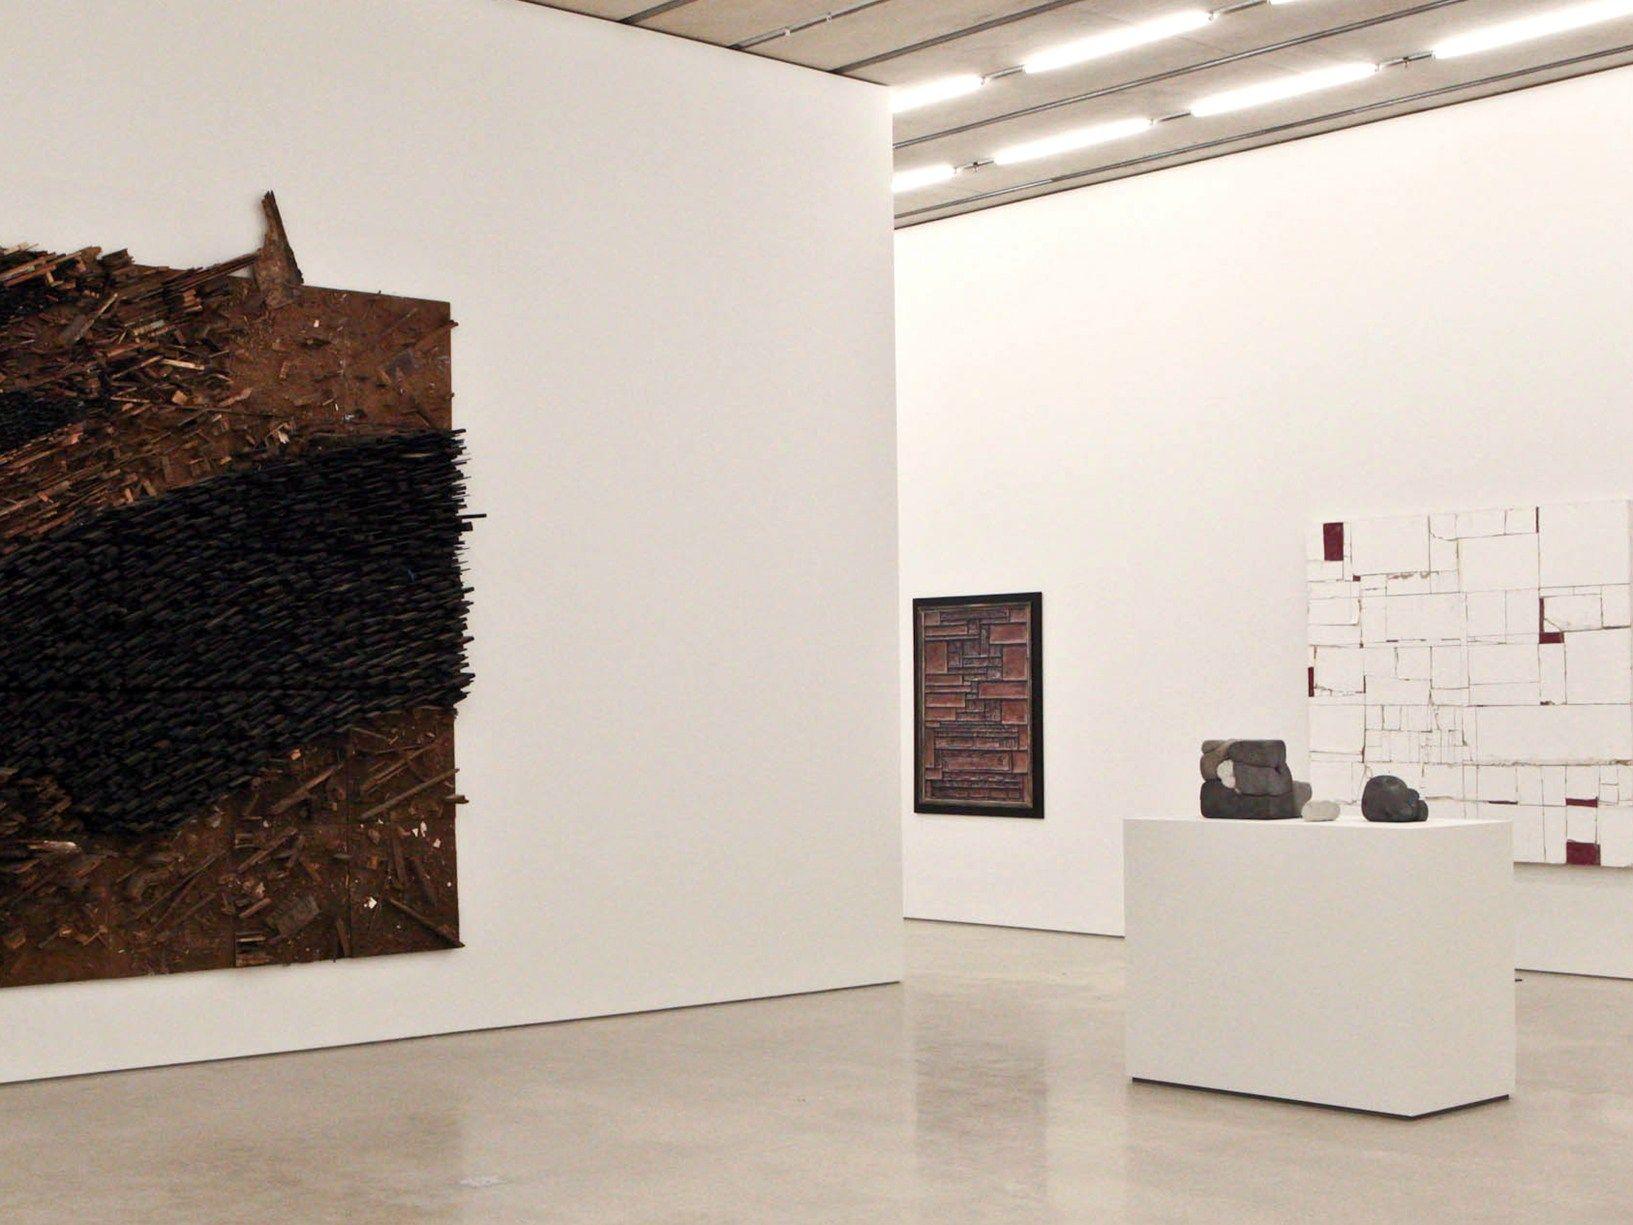 Apre i battenti il Perez Art Museum di Herzog & de Meuron